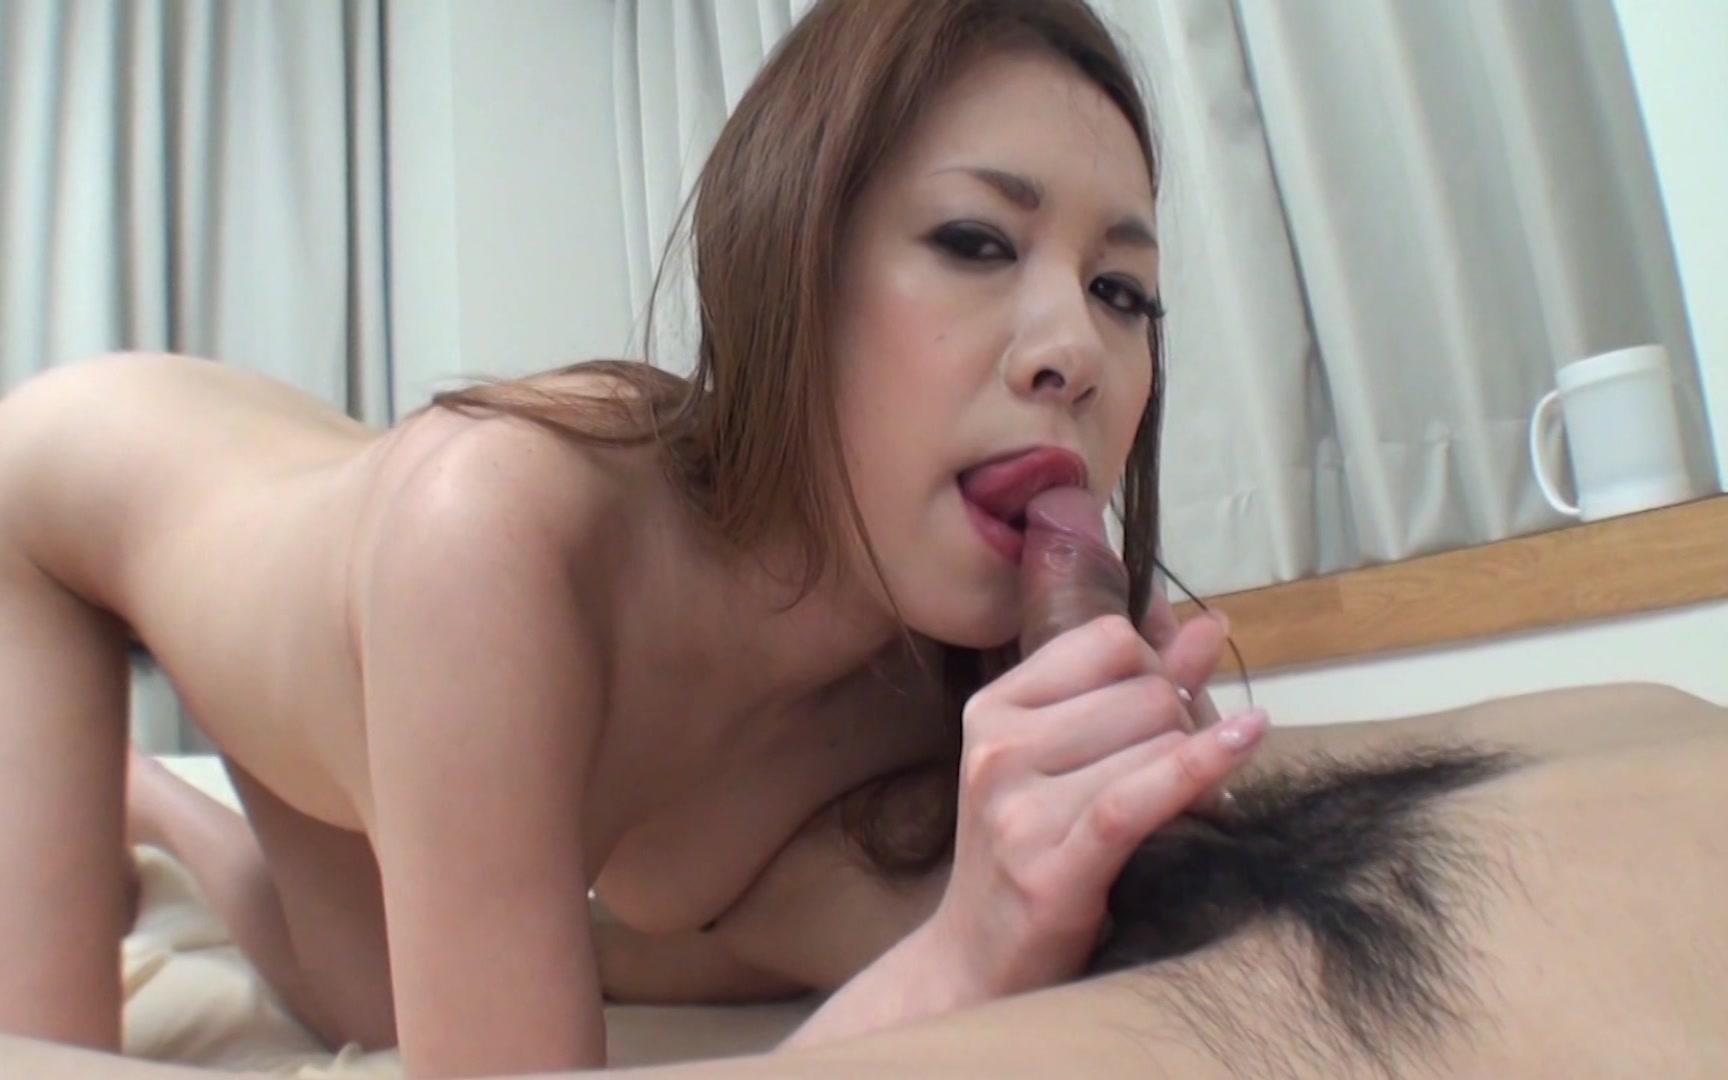 Hung Asian Cock Top asian fascination 3 | jav 1 models | sugarinstant